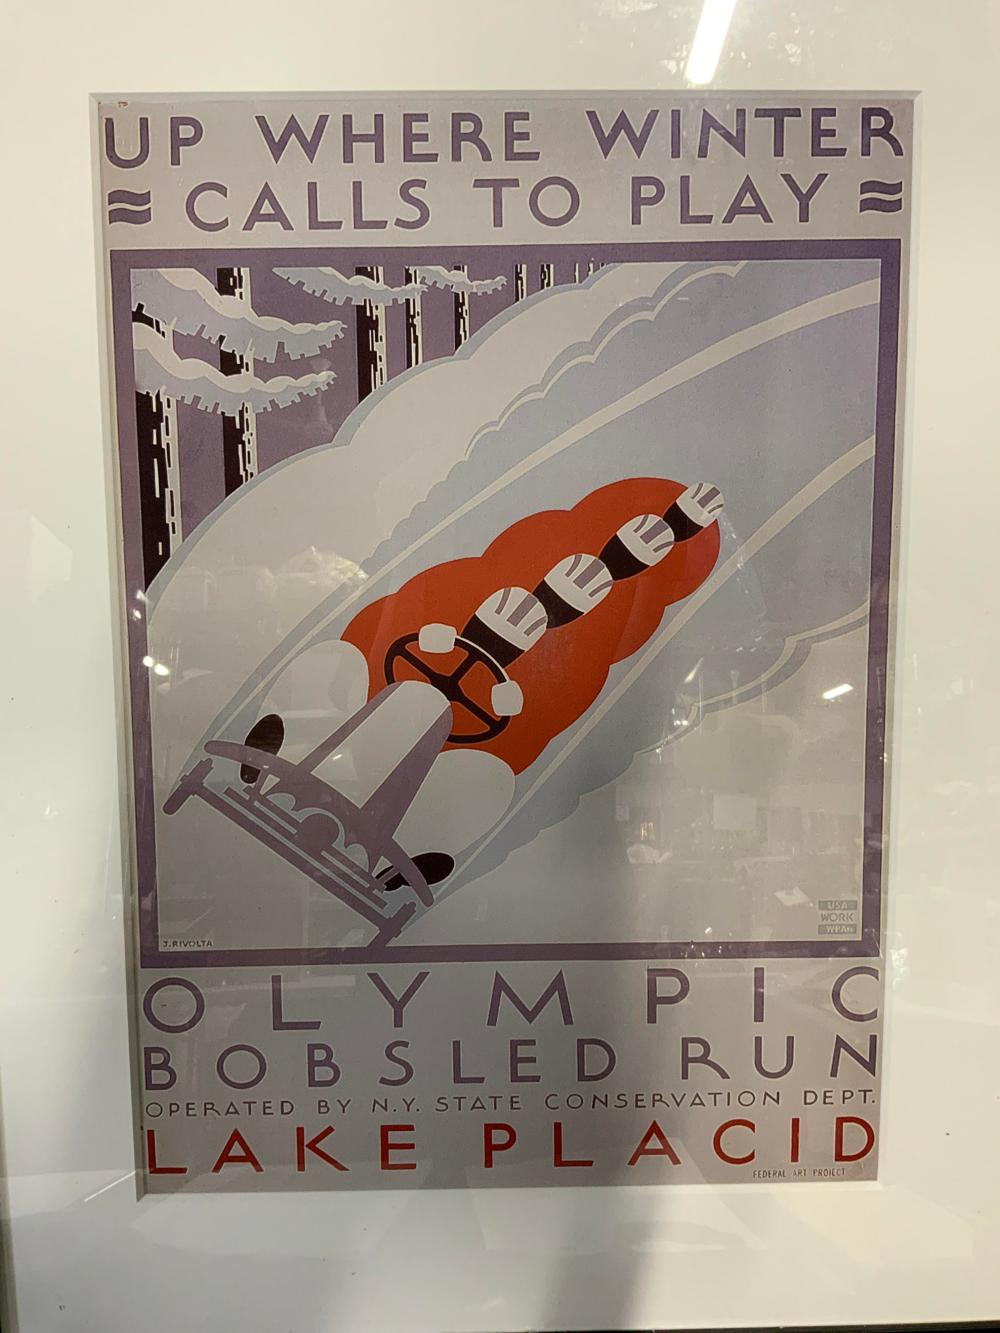 JACK RIVOLTA Silkscreen Promotional Poster